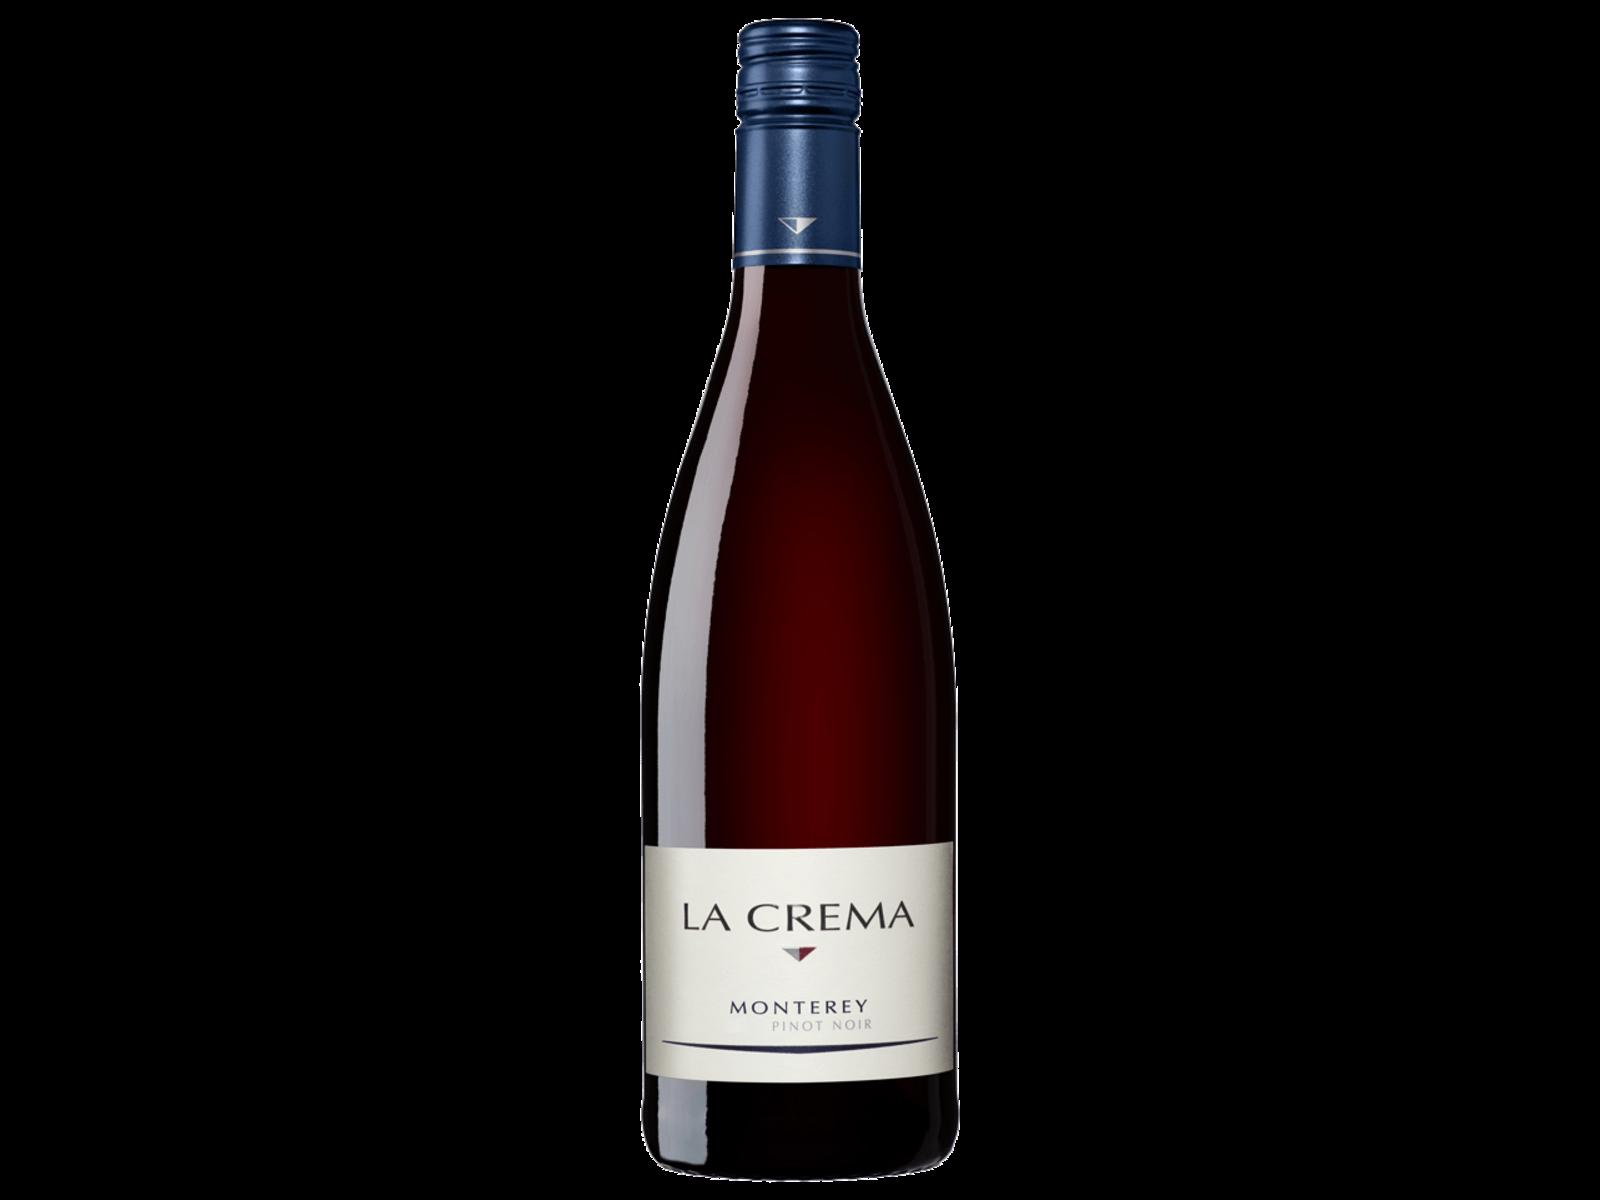 La Crema Winery La Crema / Monterey / Pinot Noir